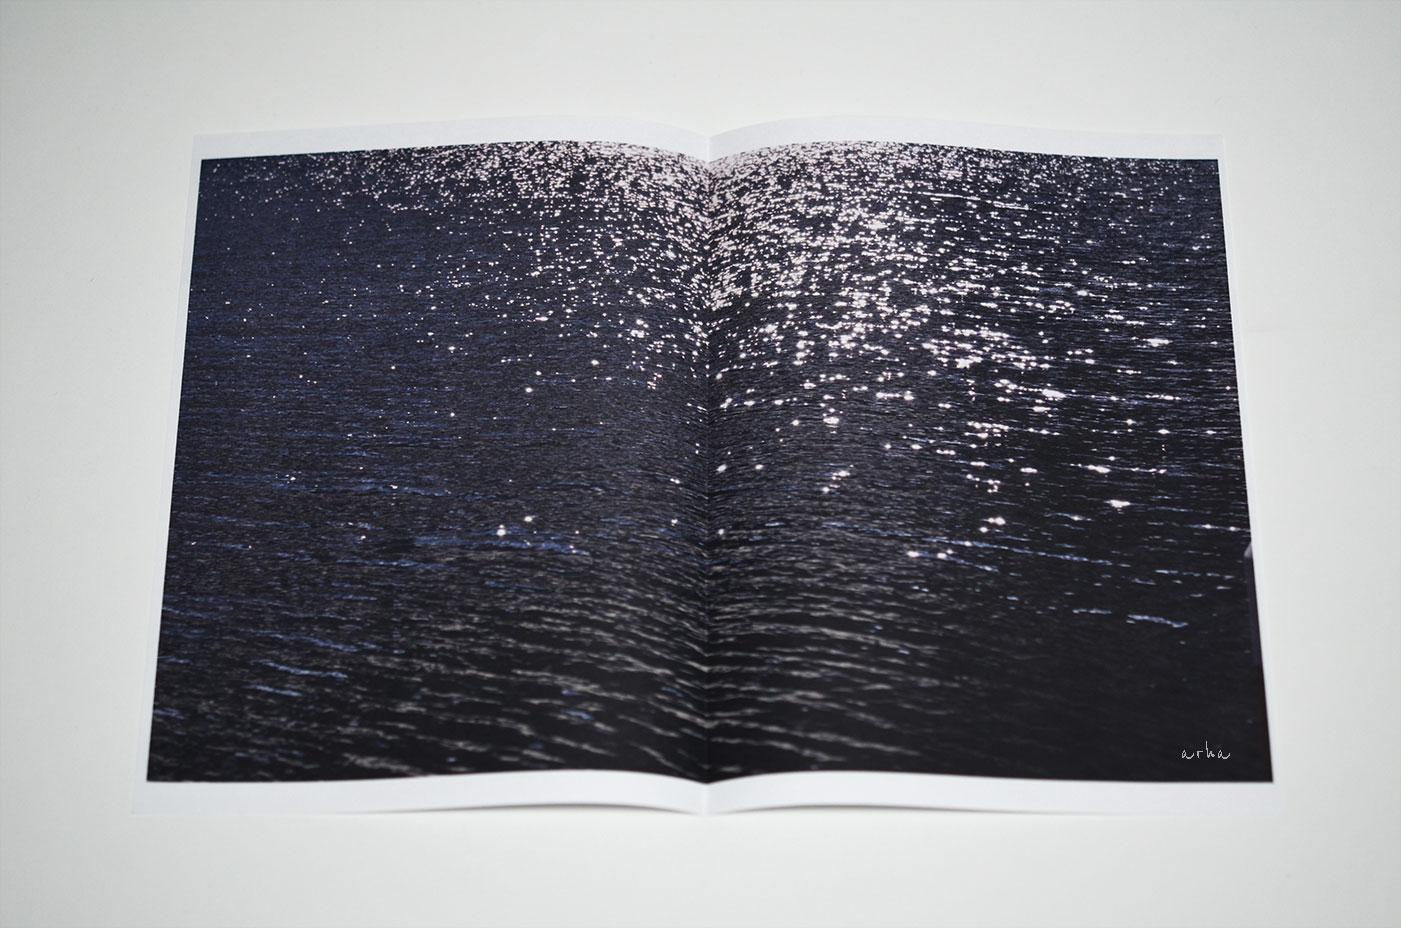 wave-bokeh-darkblue-minimalism-copyright-2013-arha-Tomomichi-Morifuji